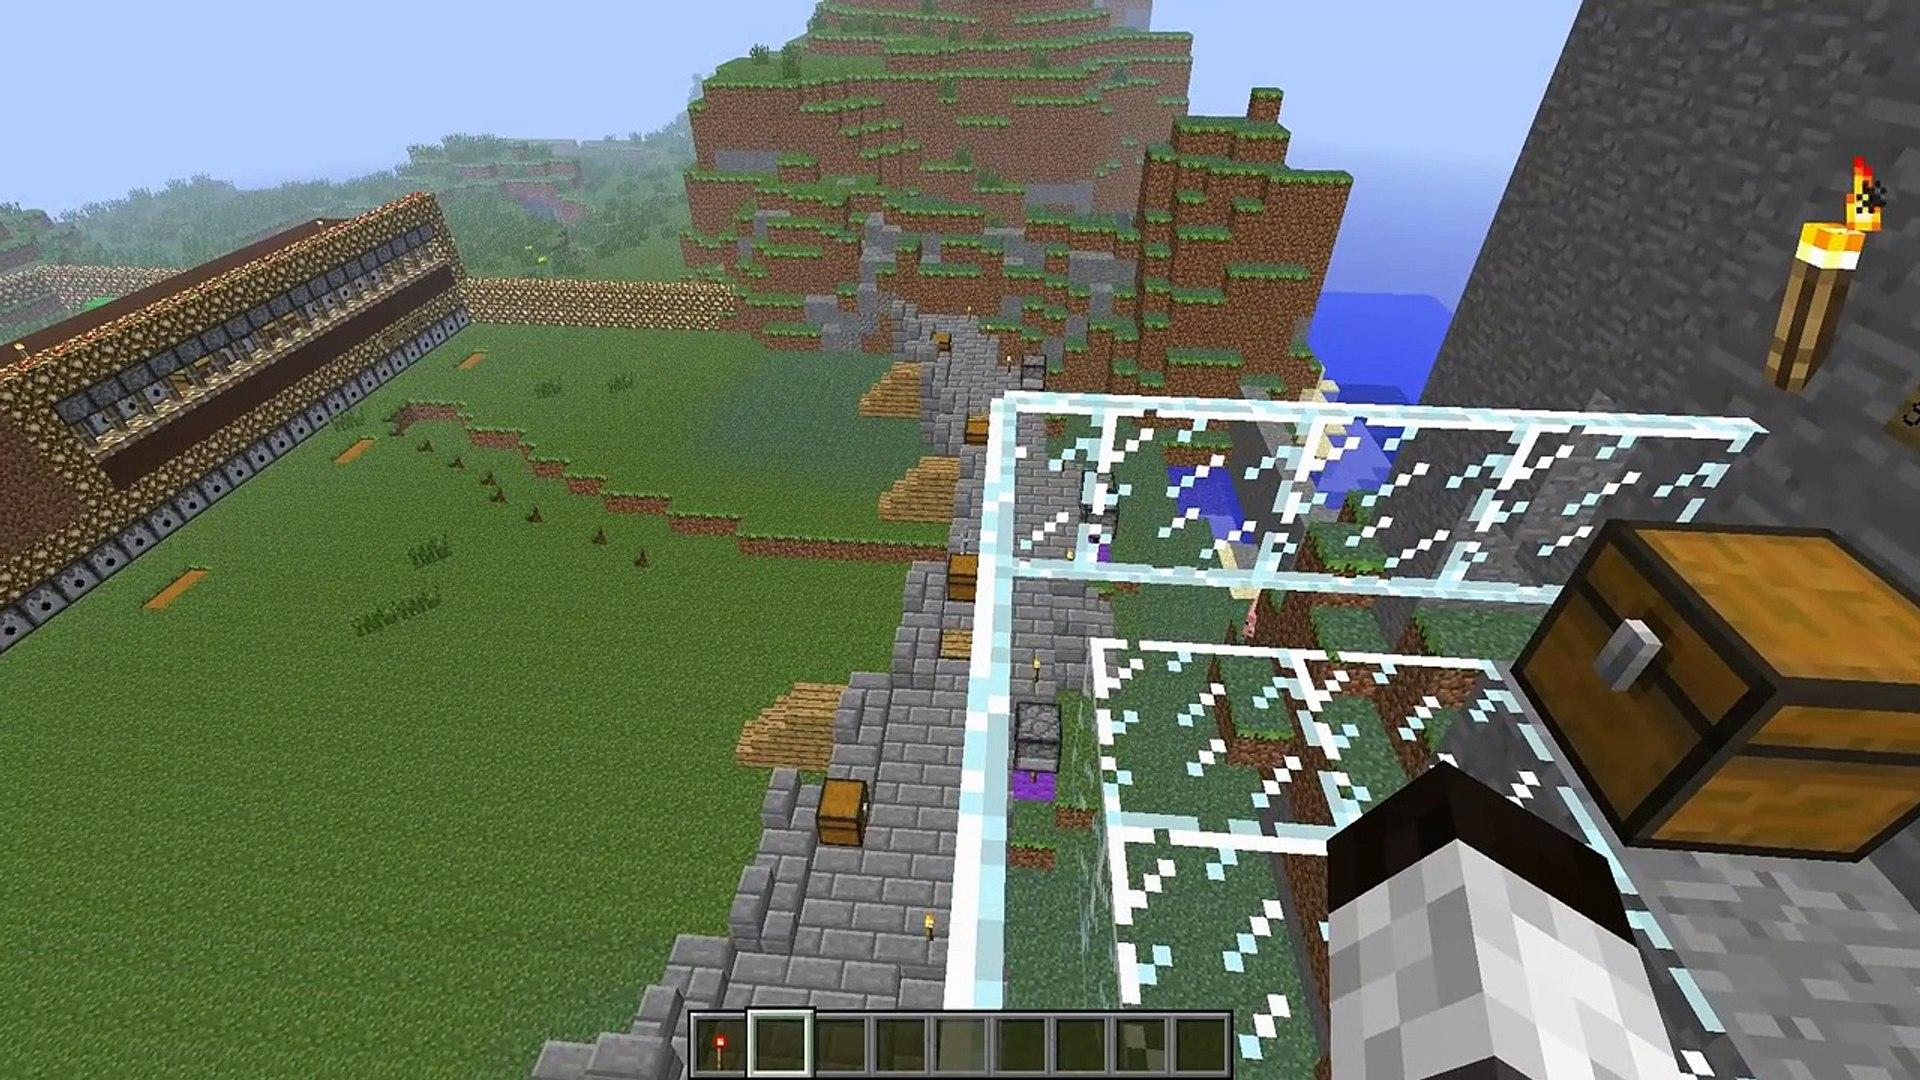 Minecraft 10.000 Clay Soldier - HdR / LotR Helms Klamm / Helms Deep